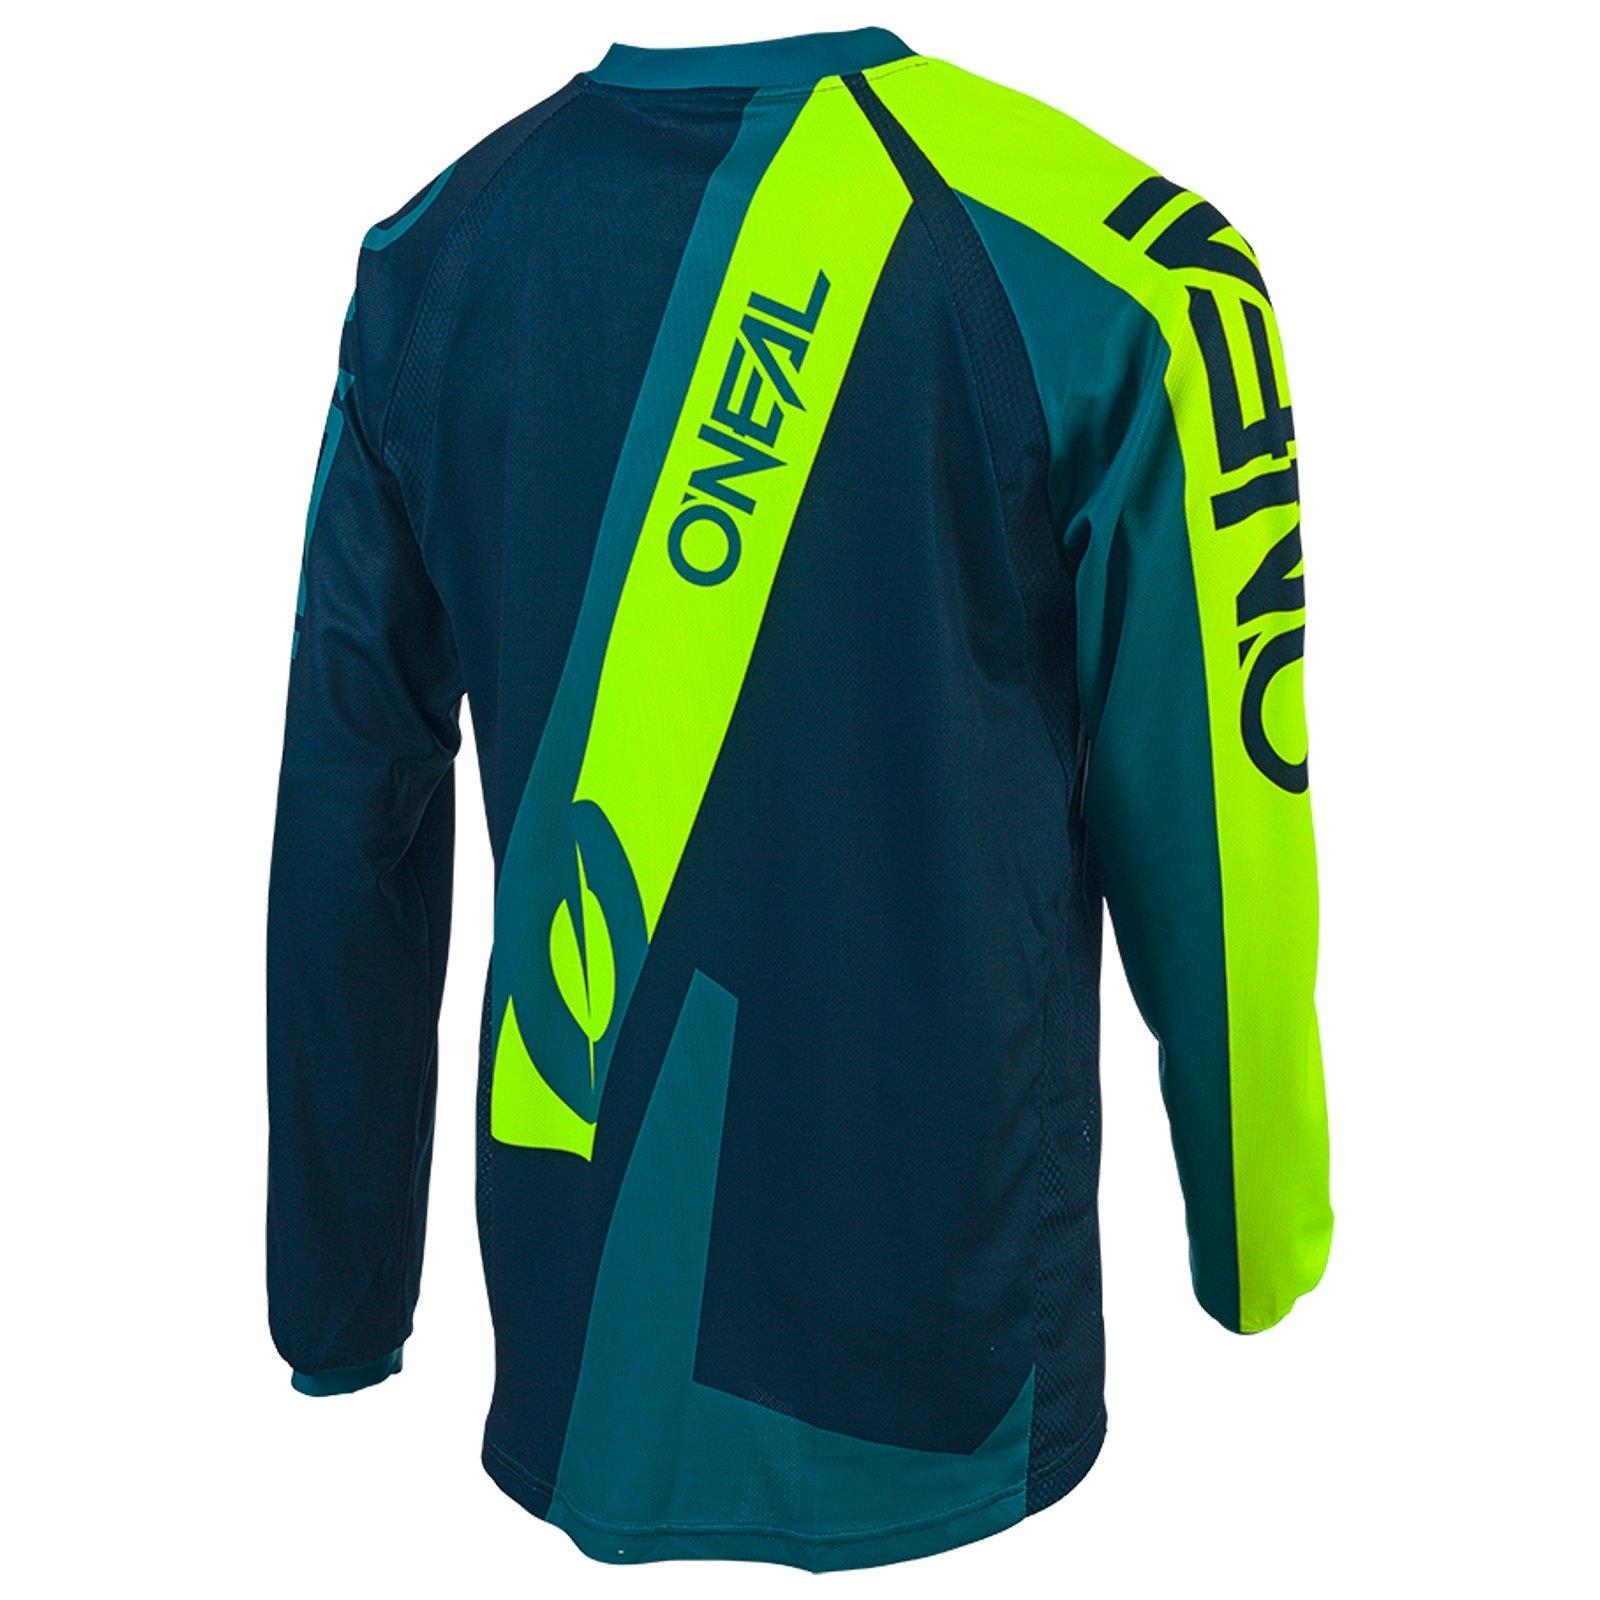 O-039-Neal-elemento-Mayhem-JERSEY-Racewear-Motocross-Maglia-MX-DH-FR-MTB-MOUNTAIN-BIKE miniatura 64